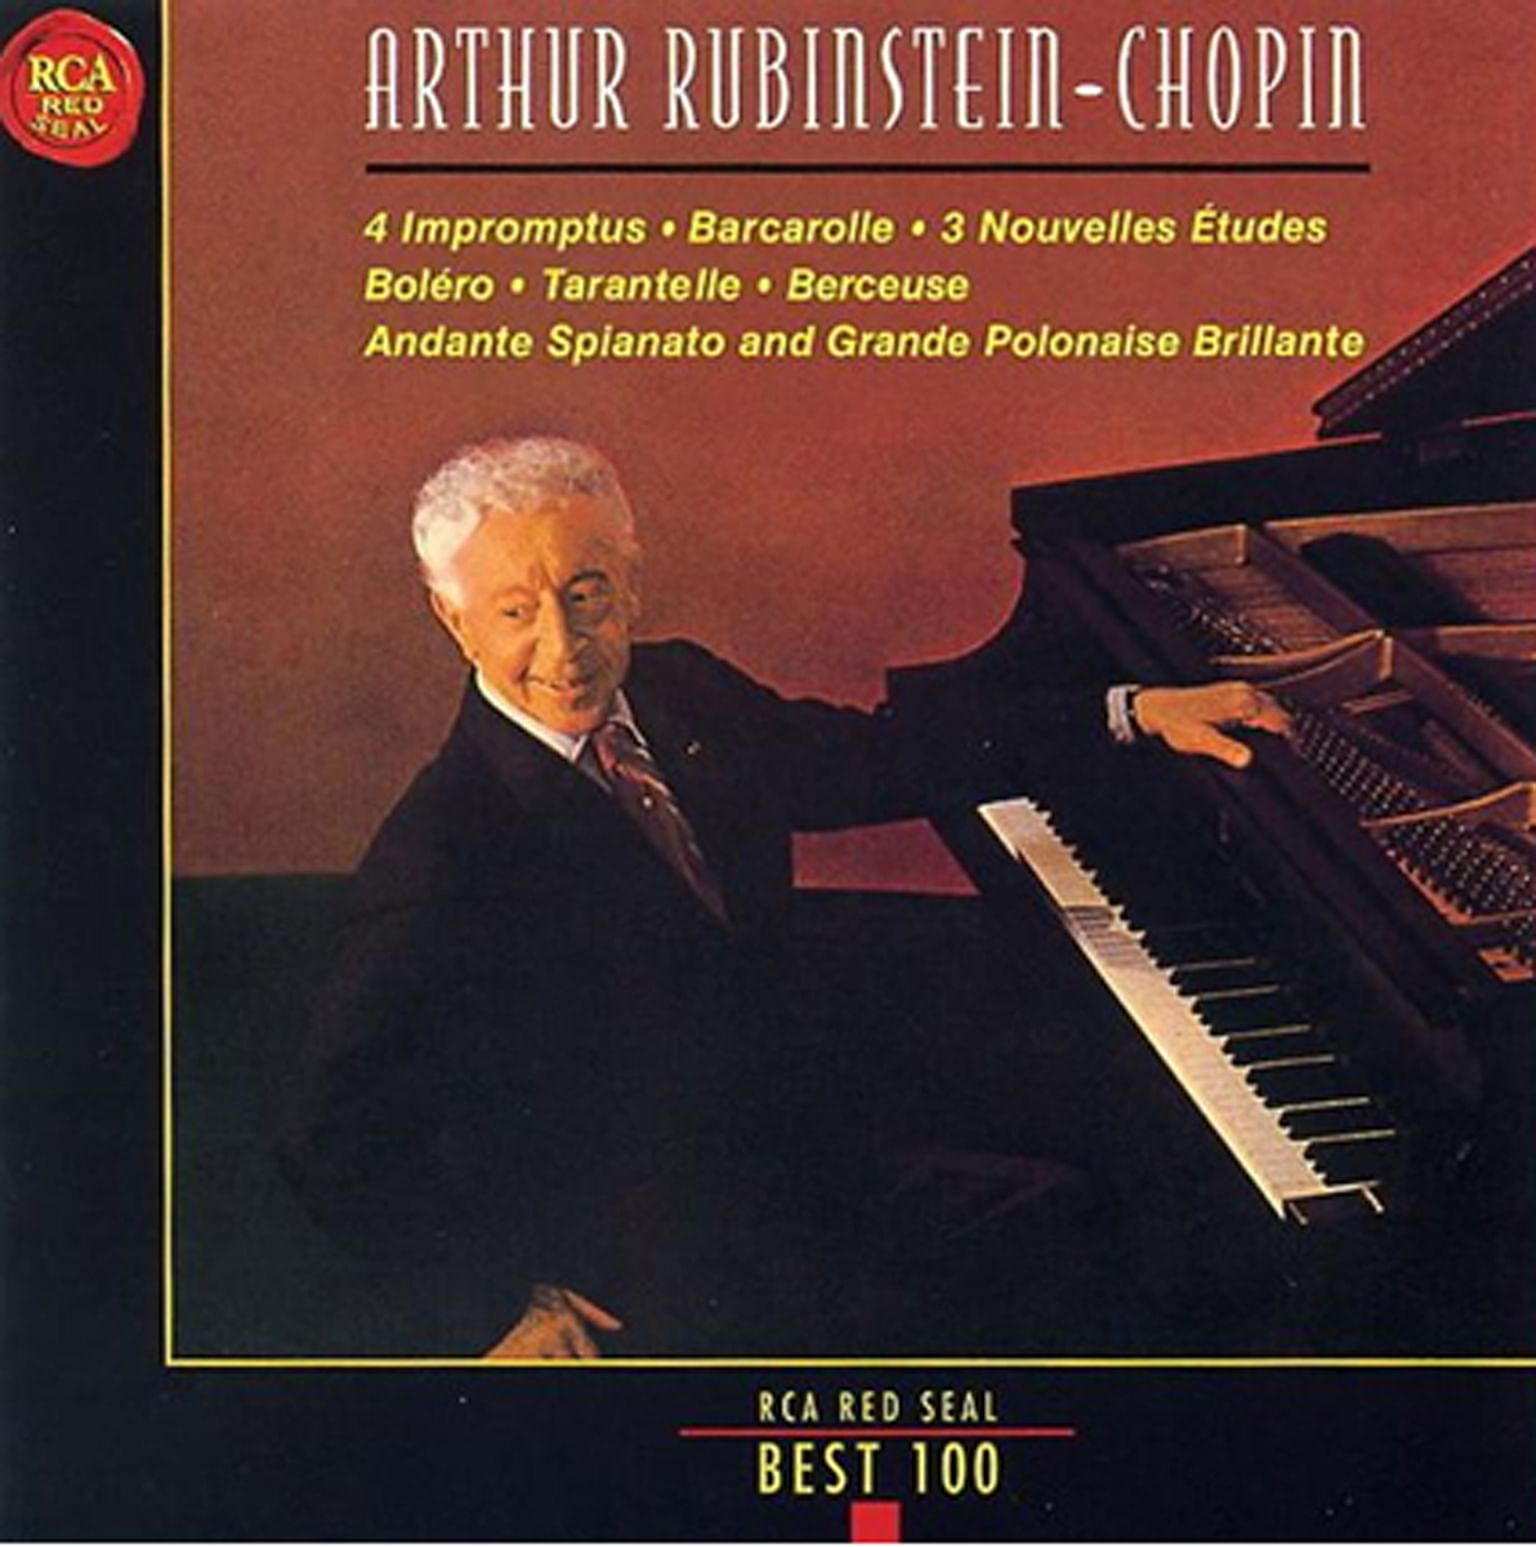 Pianist Arthur Rubinstein's takes on Grieg's Piano Concerto